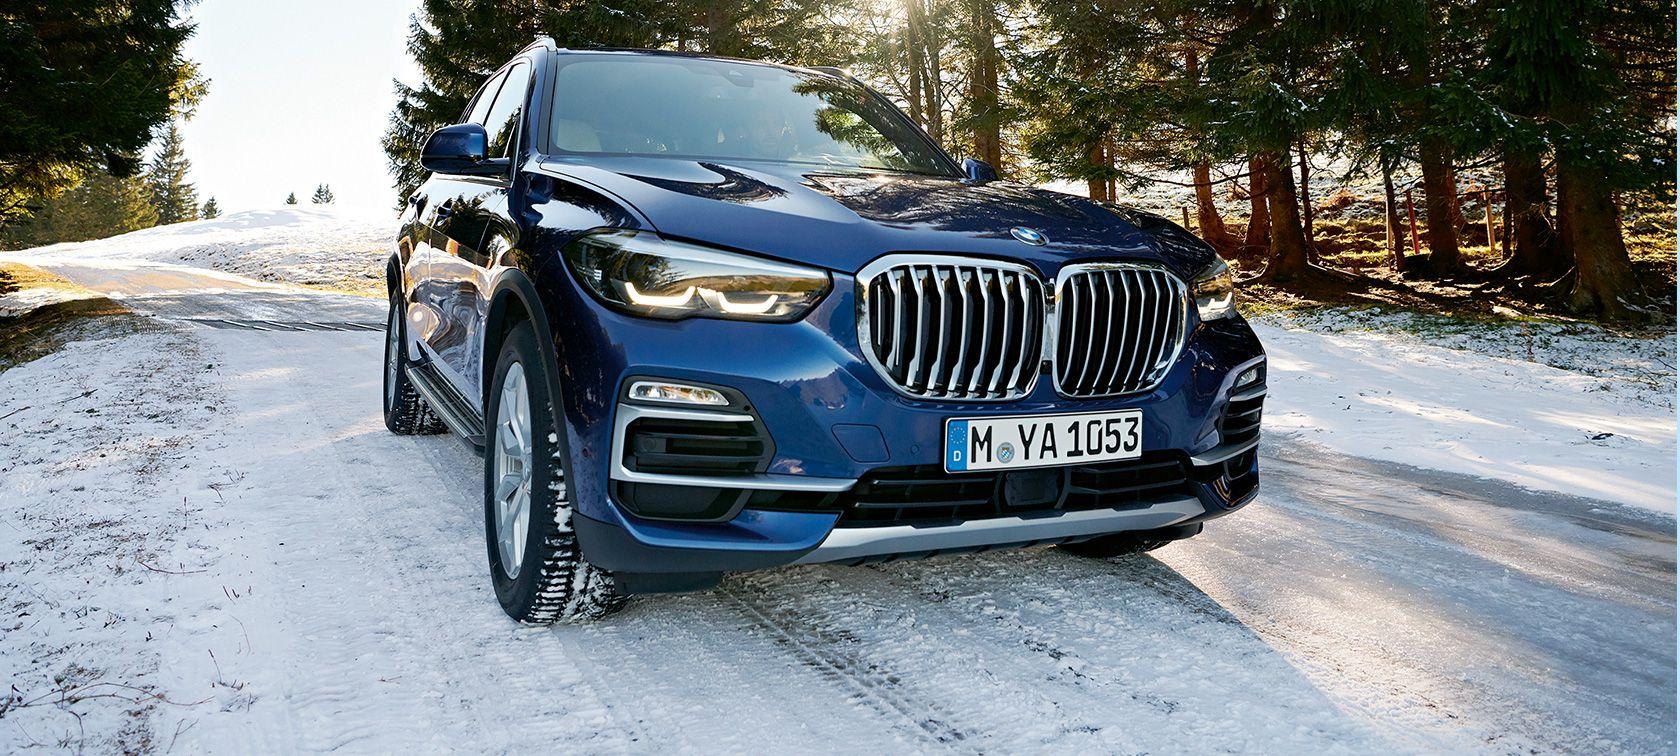 BMW X5 G05 in winter